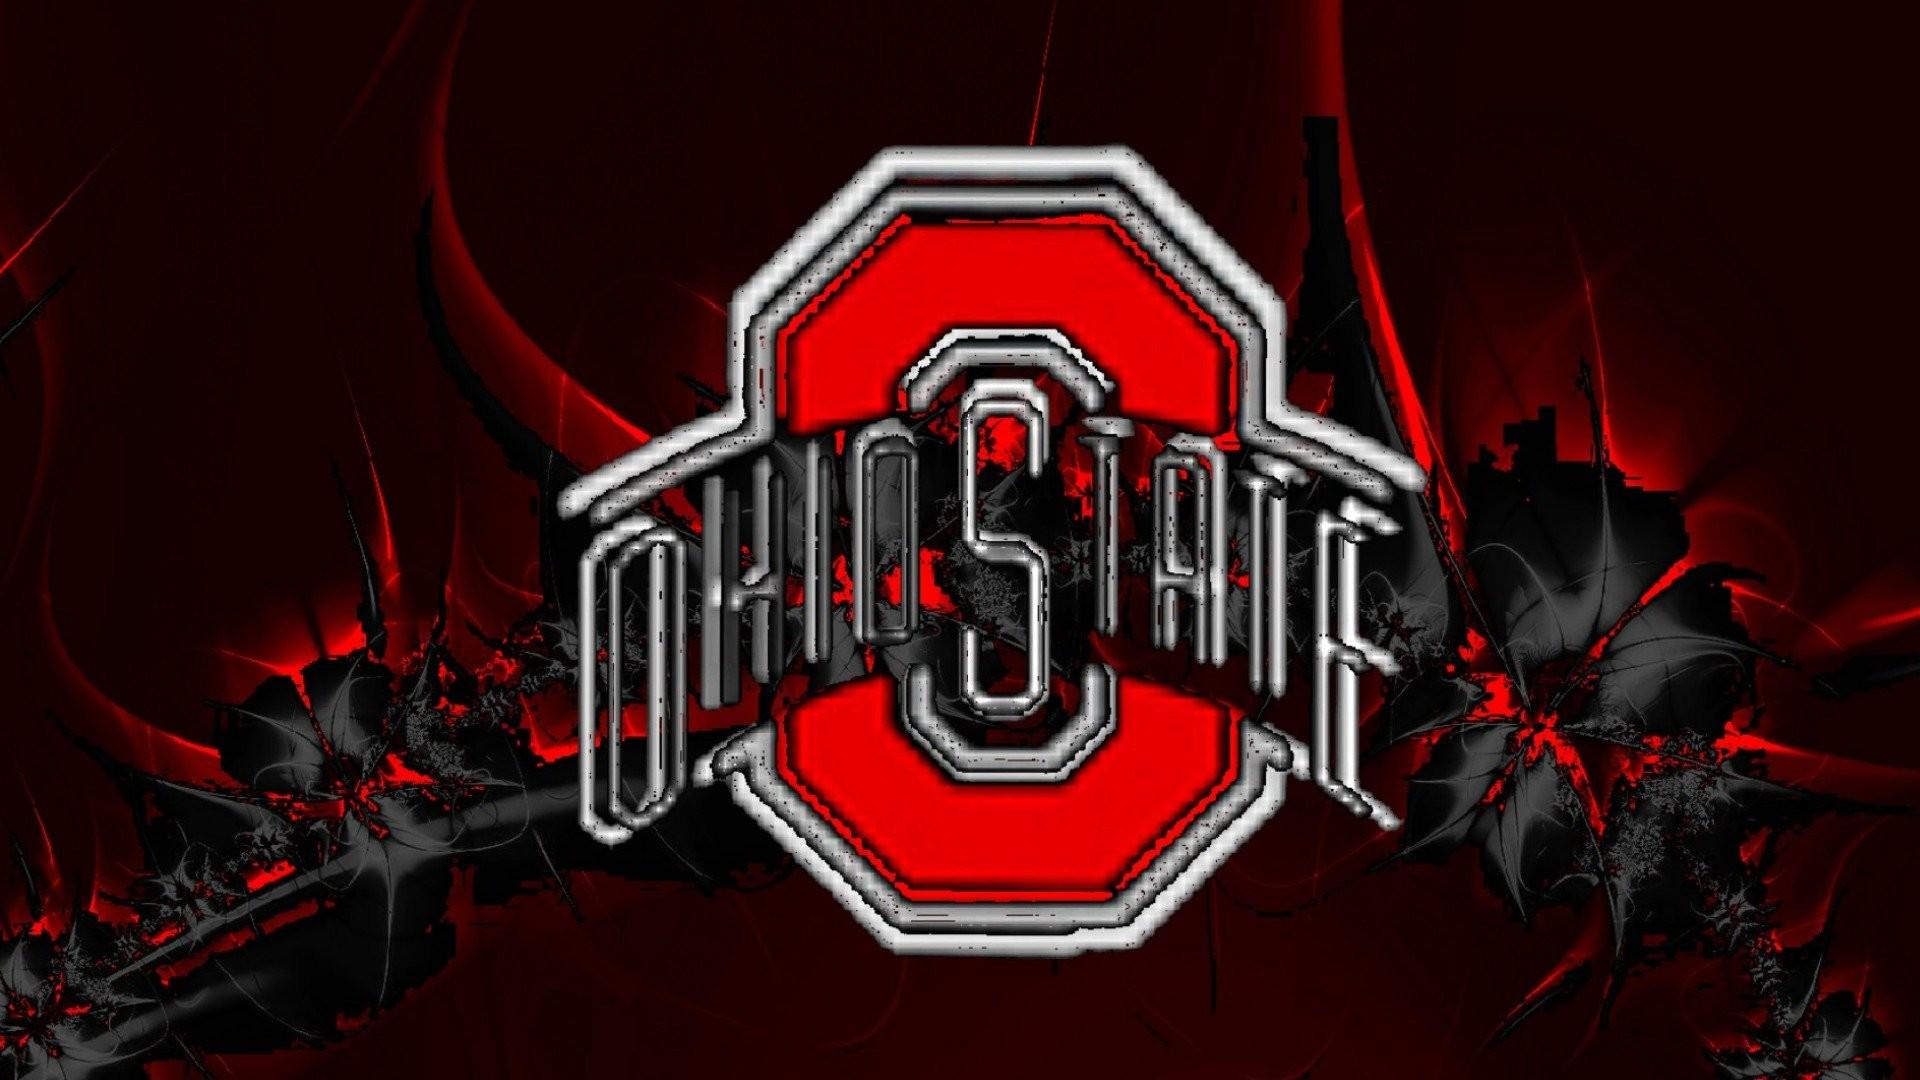 Ohio State Football 607726 …